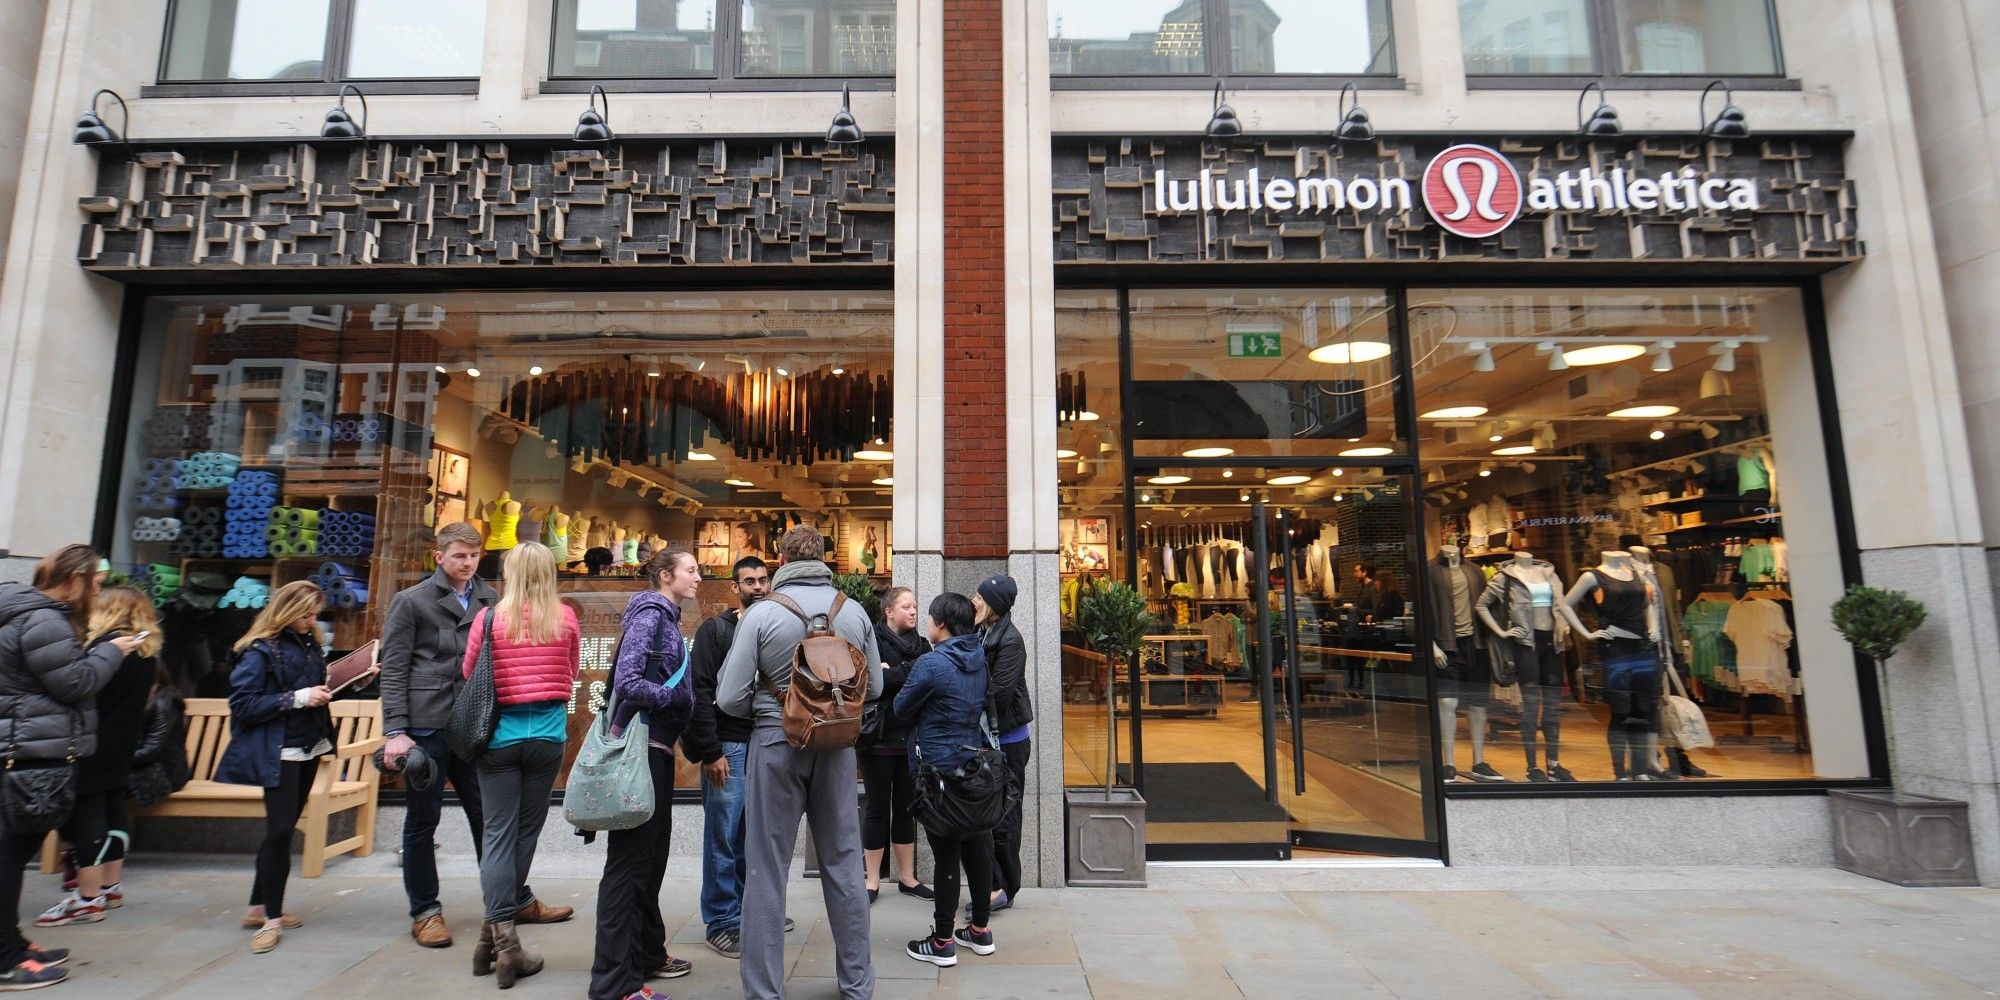 Lululemon's Shopping Bag Features Anti-Sunscreen Warning